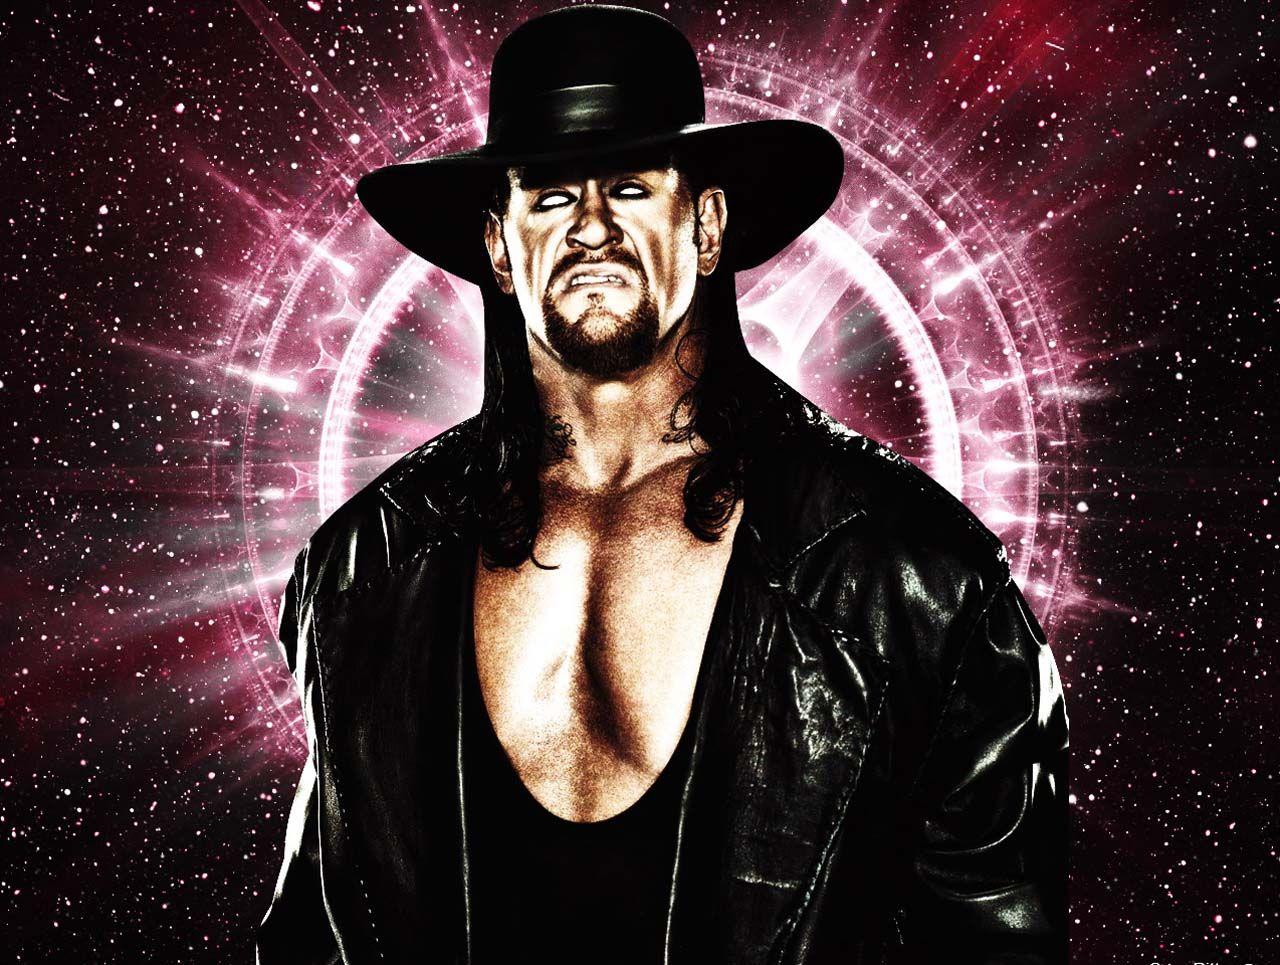 8chan Wallpaper: Undertaker Wallpapers 2015 HD - Wallpaper Cave